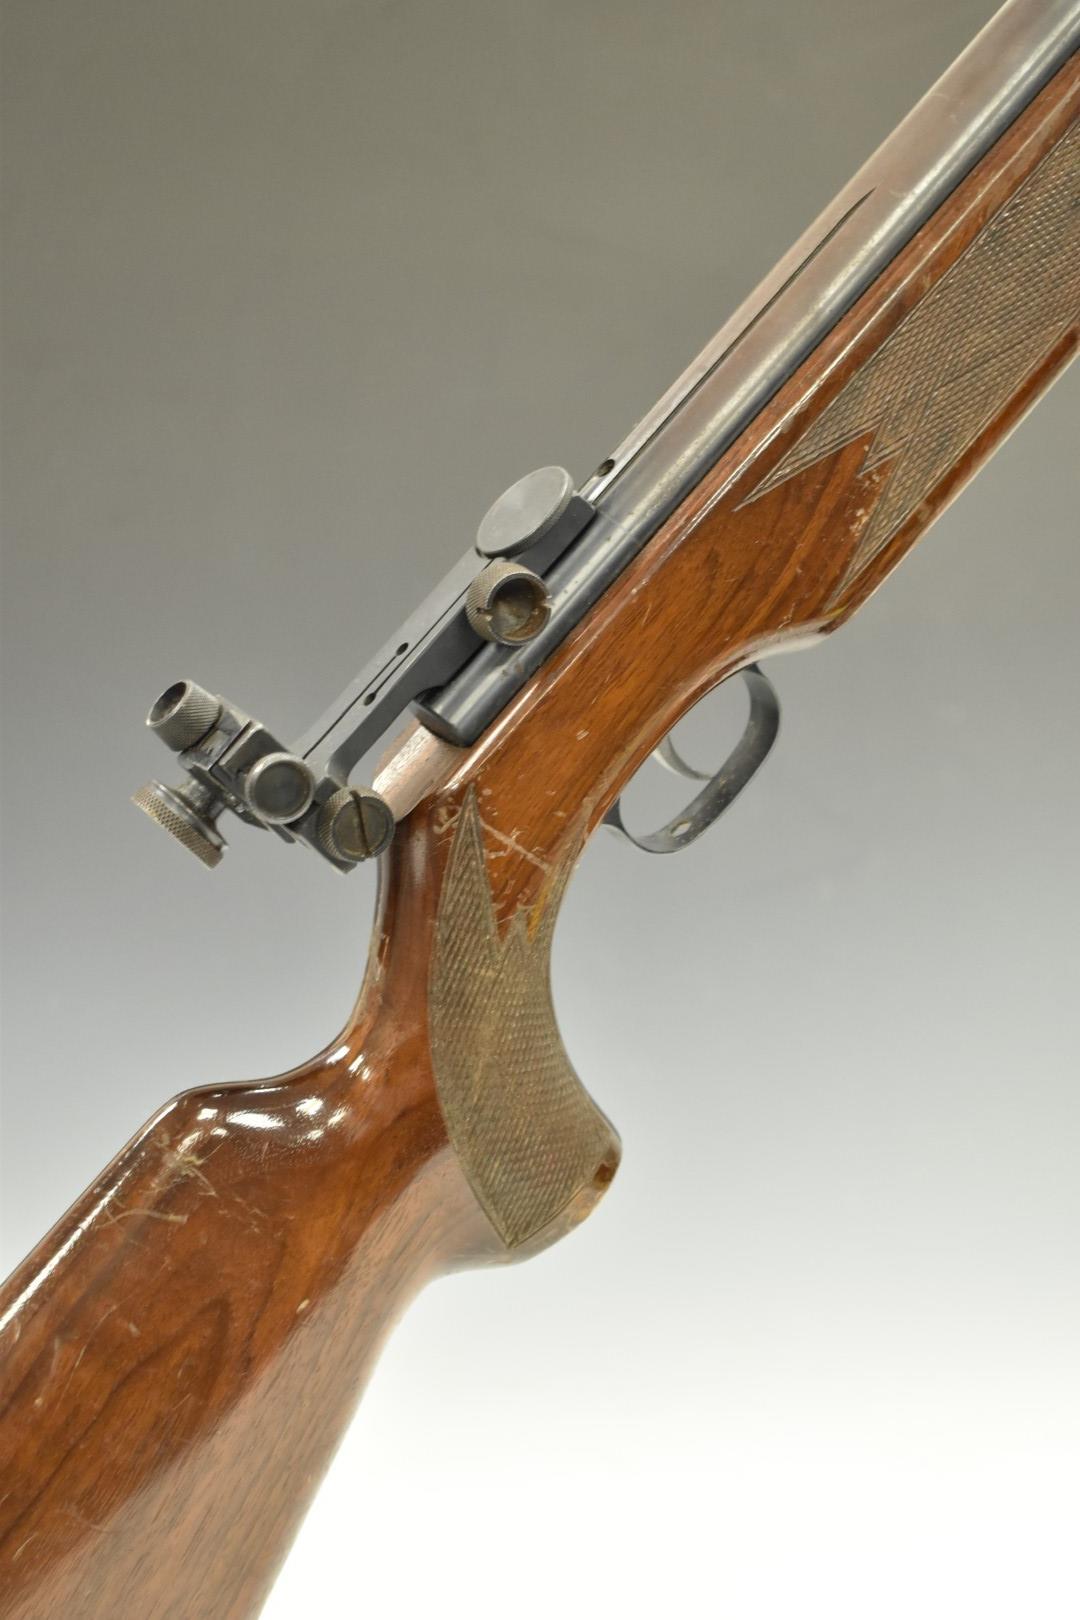 Weihrauch HW55 .177 air rifle with chequered semi-pistol grip, adjustable trigger, raised cheek